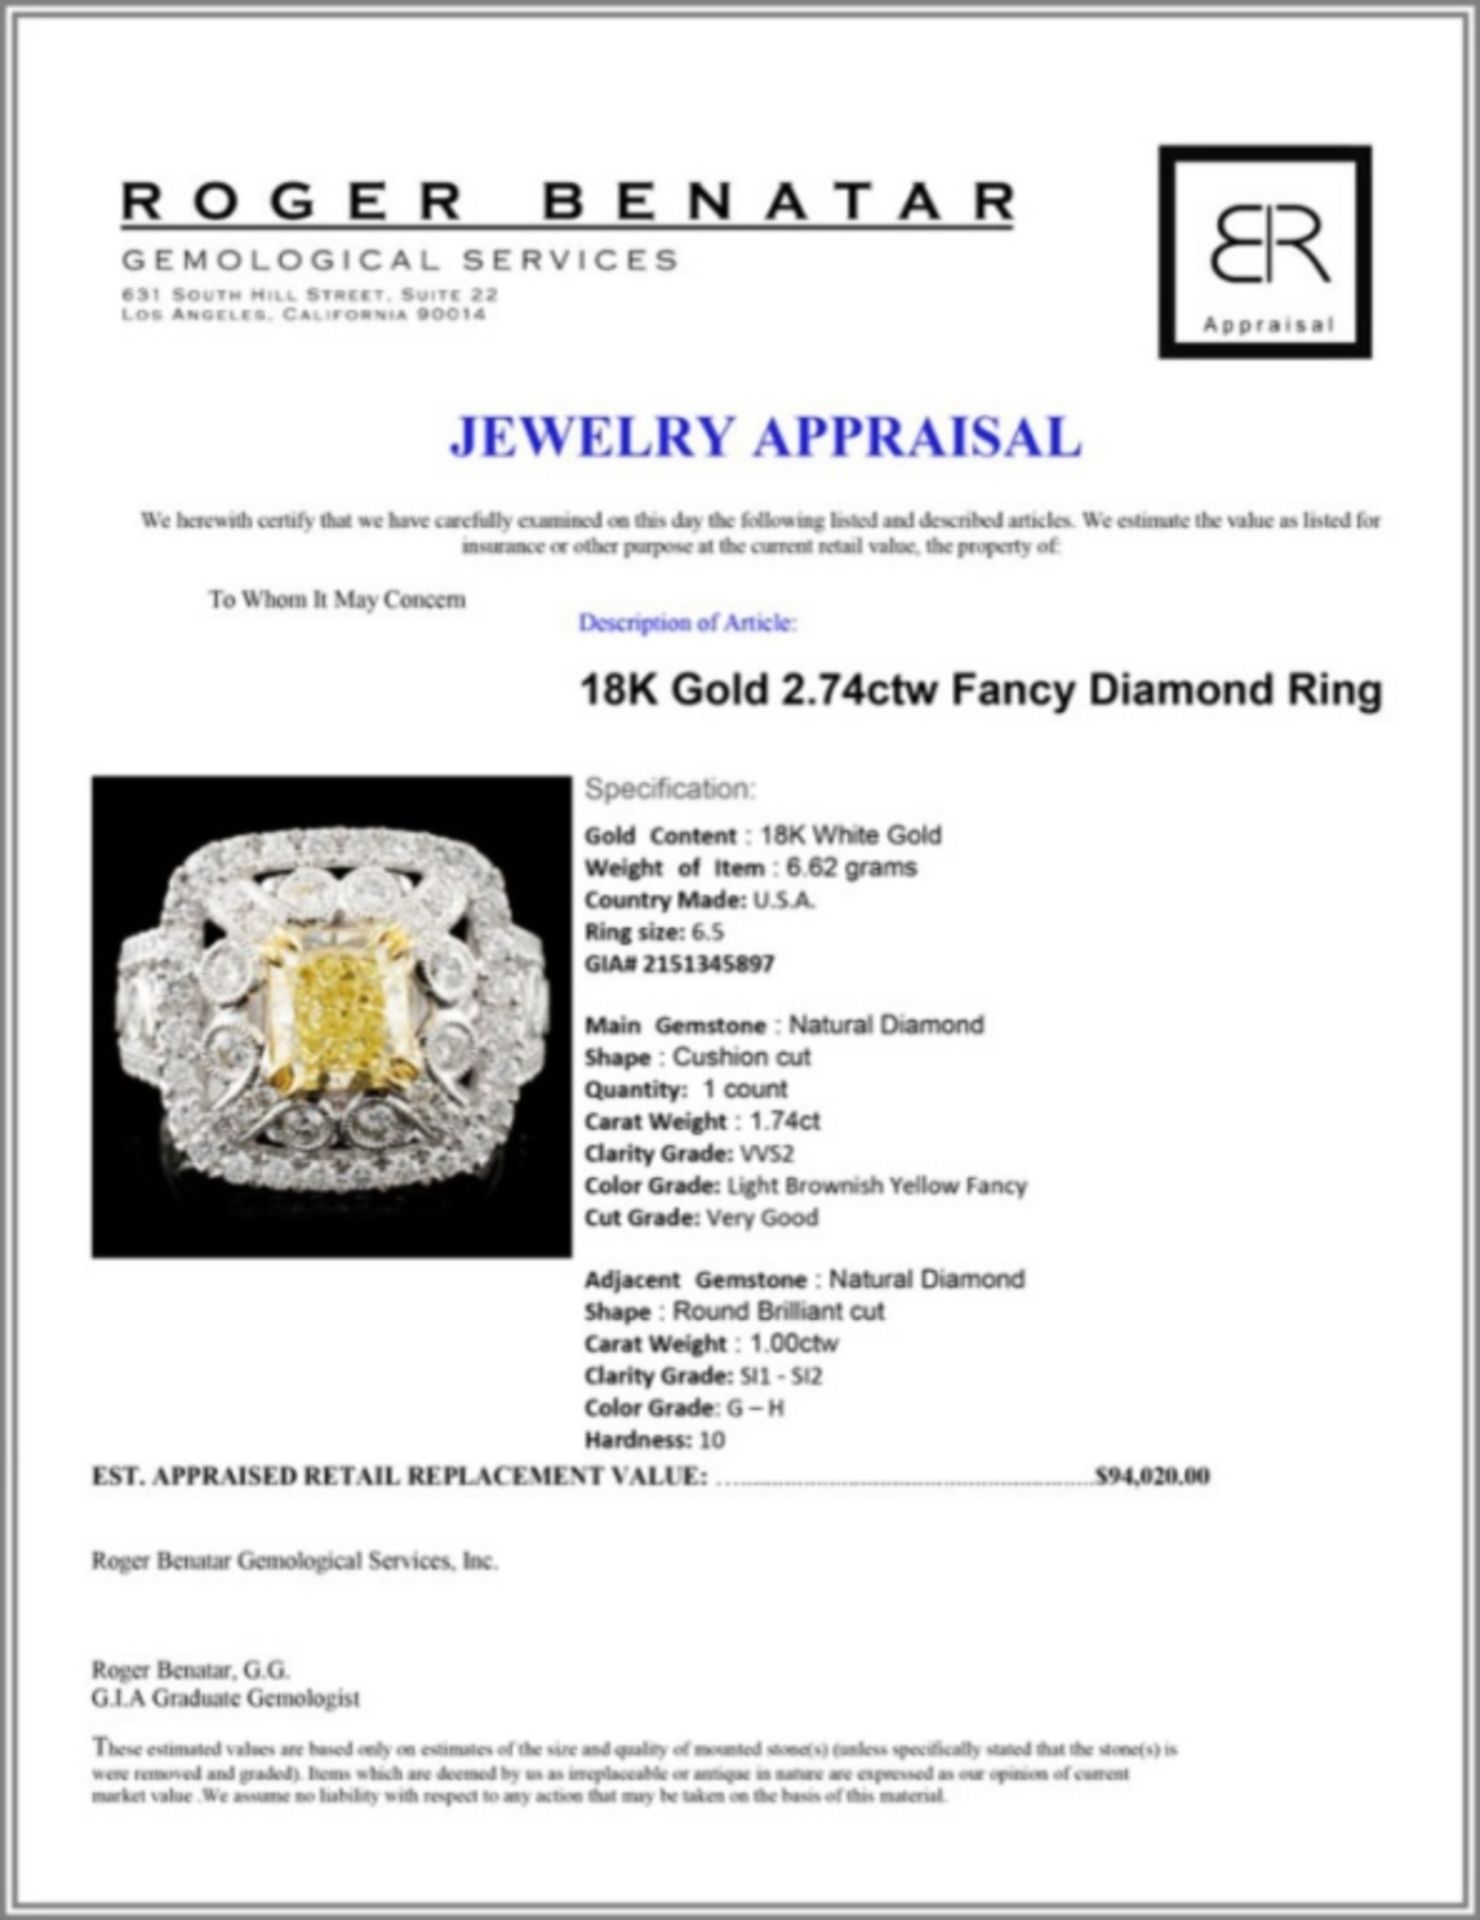 18K Gold 2.74ctw Fancy Diamond Ring - Image 4 of 4